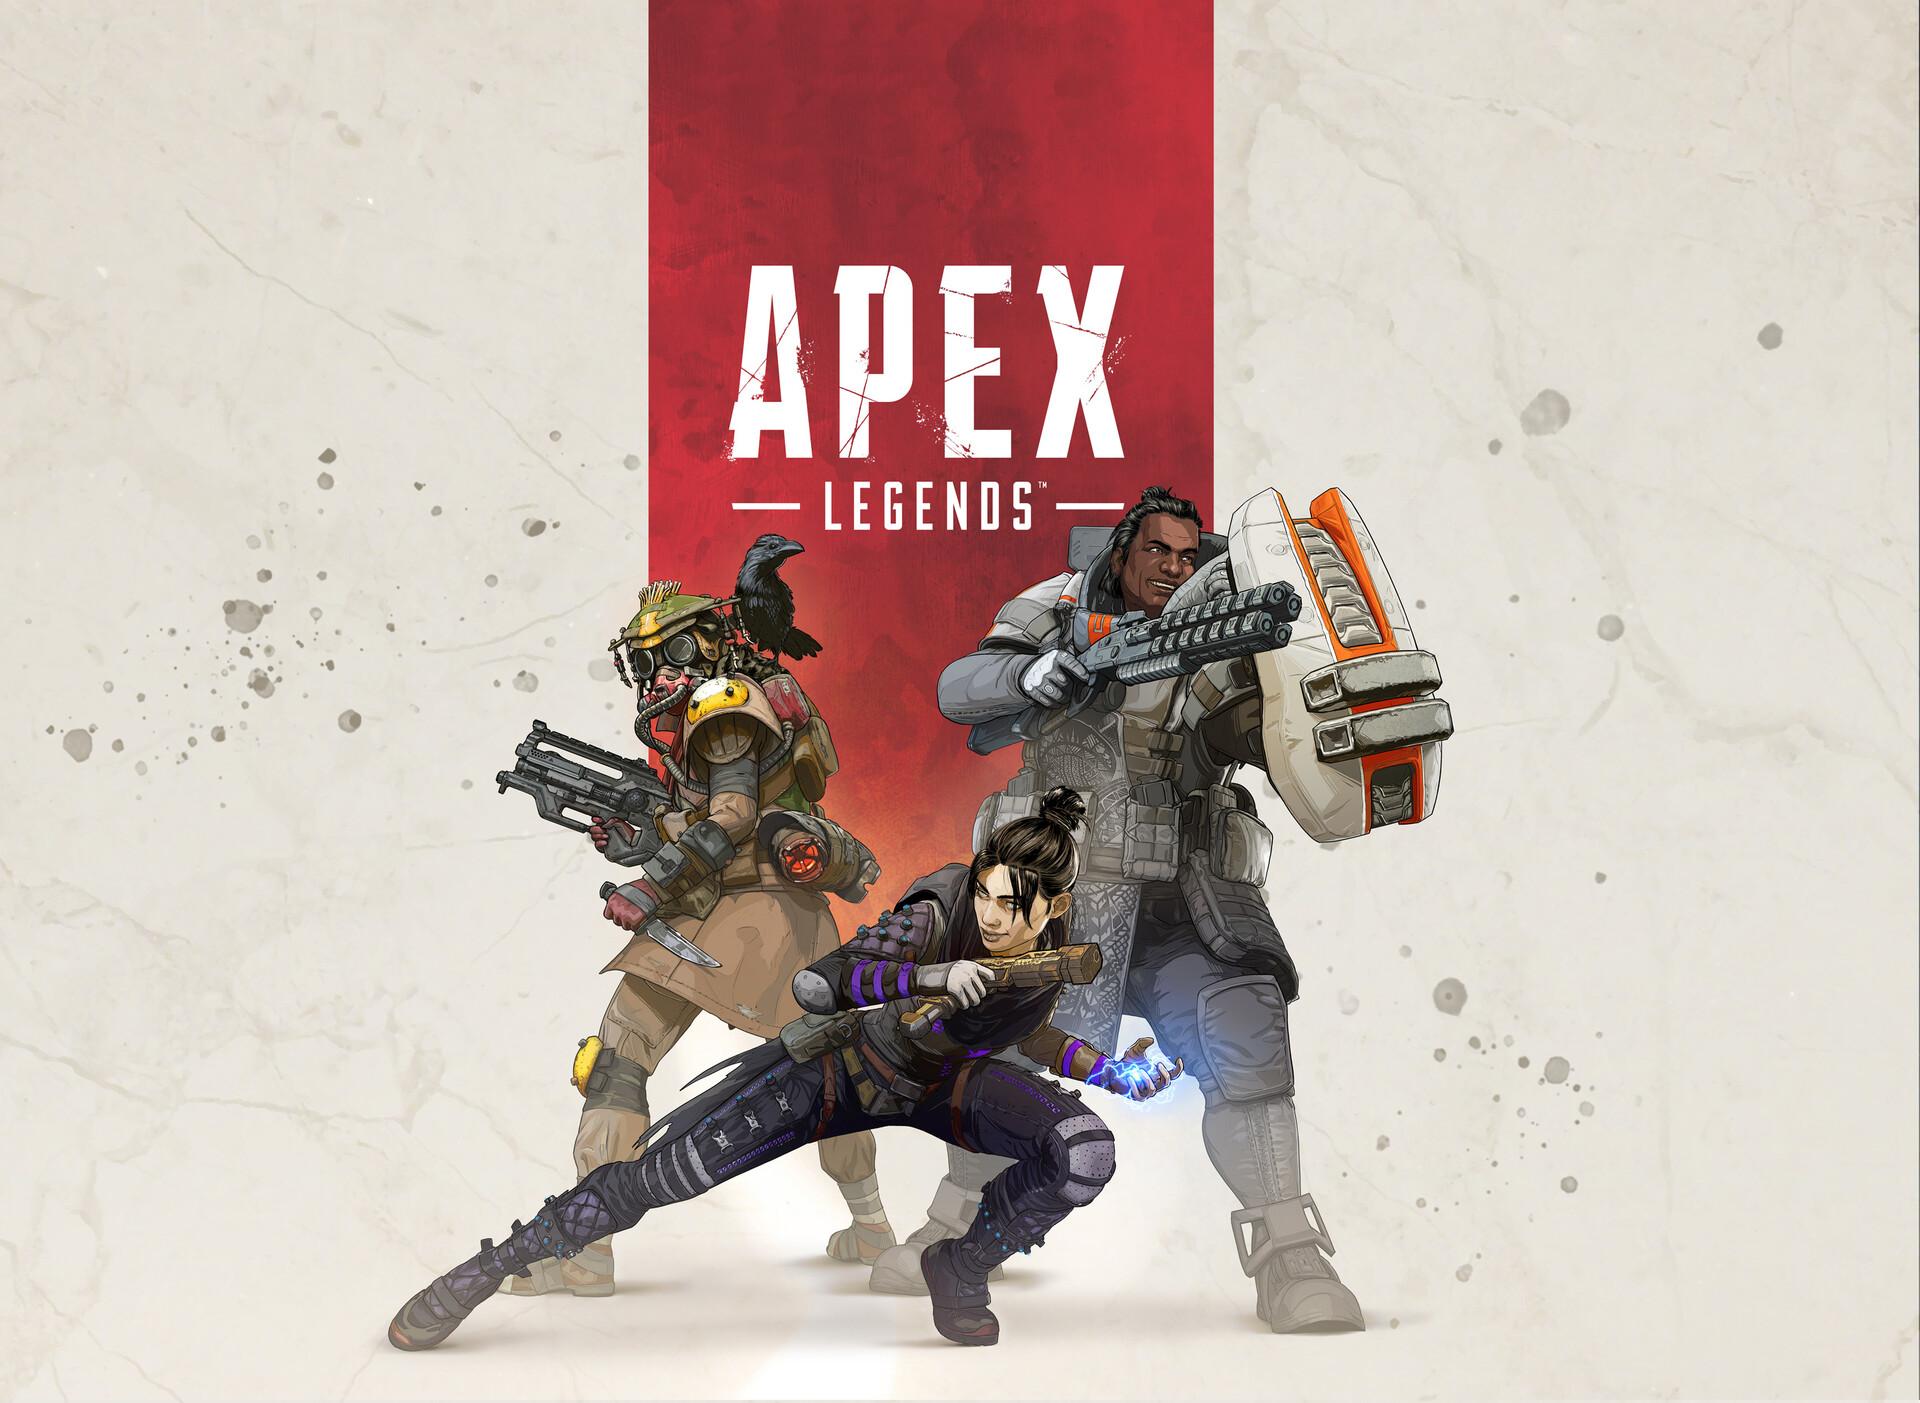 Box Art for Apex Legends.